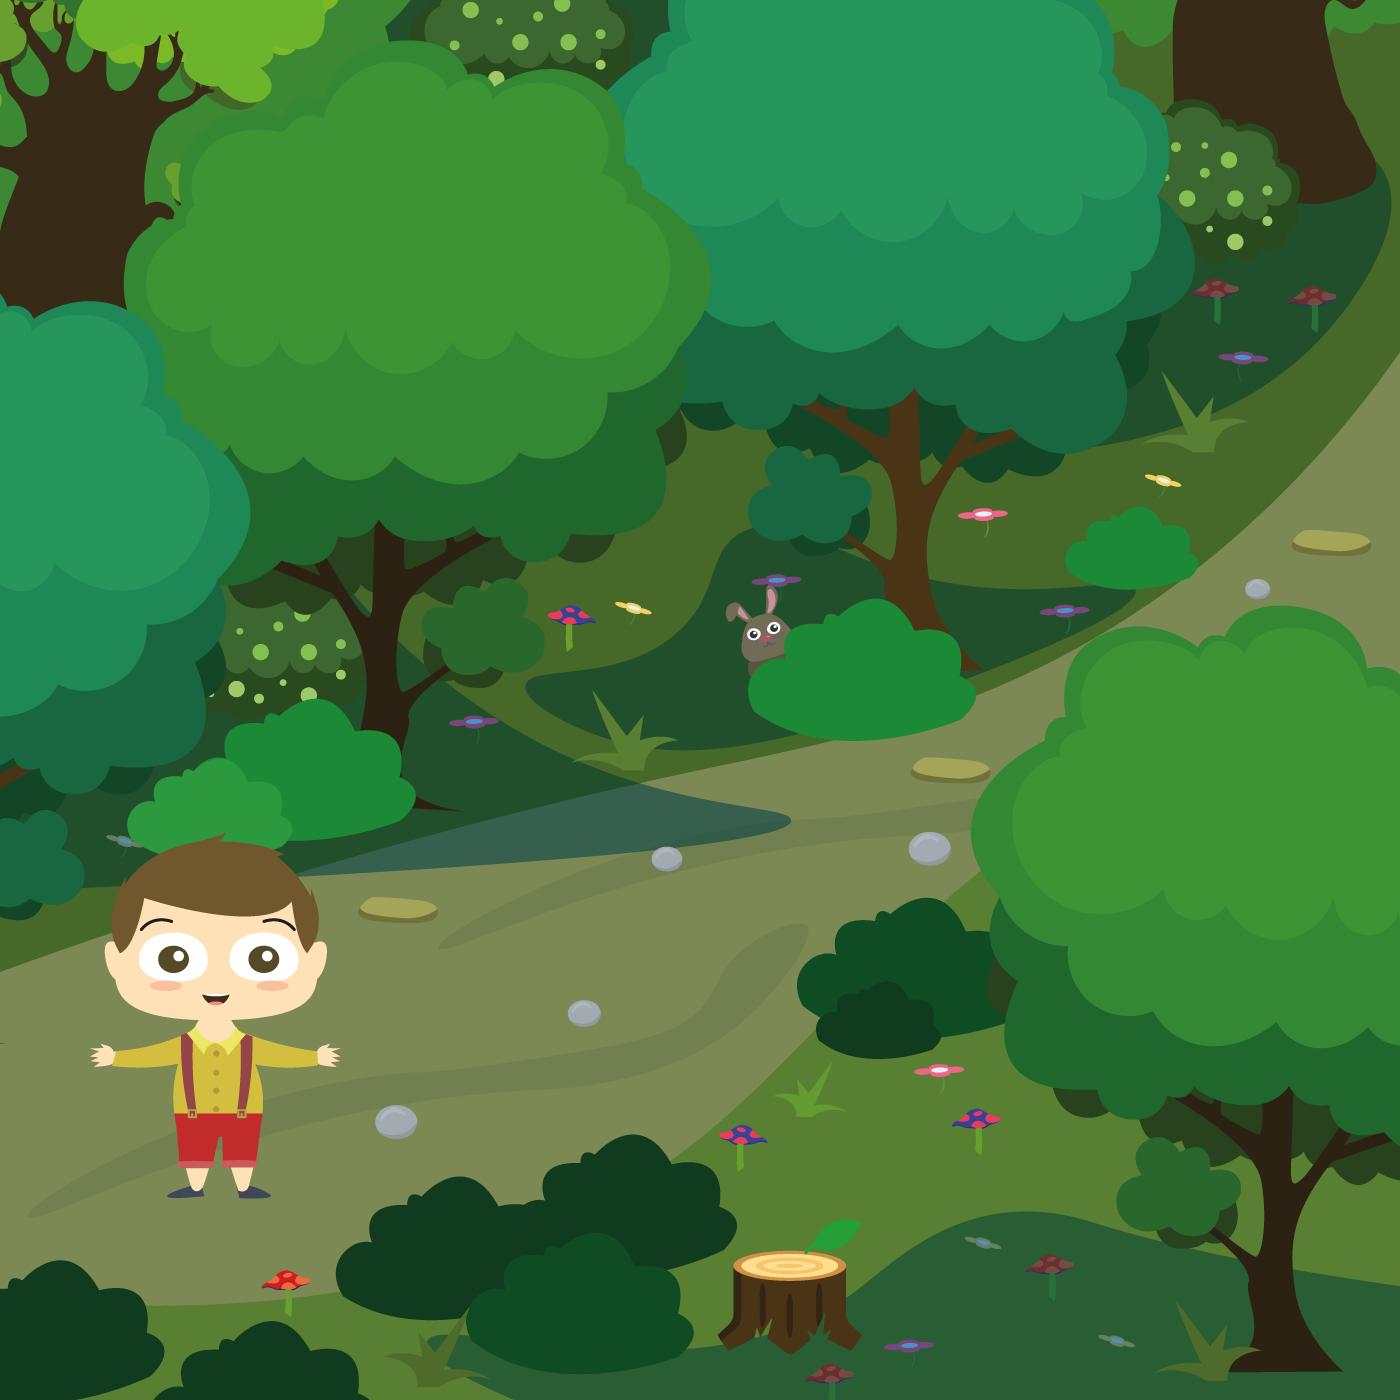 Little Tom Thumb 👦 - PART 2